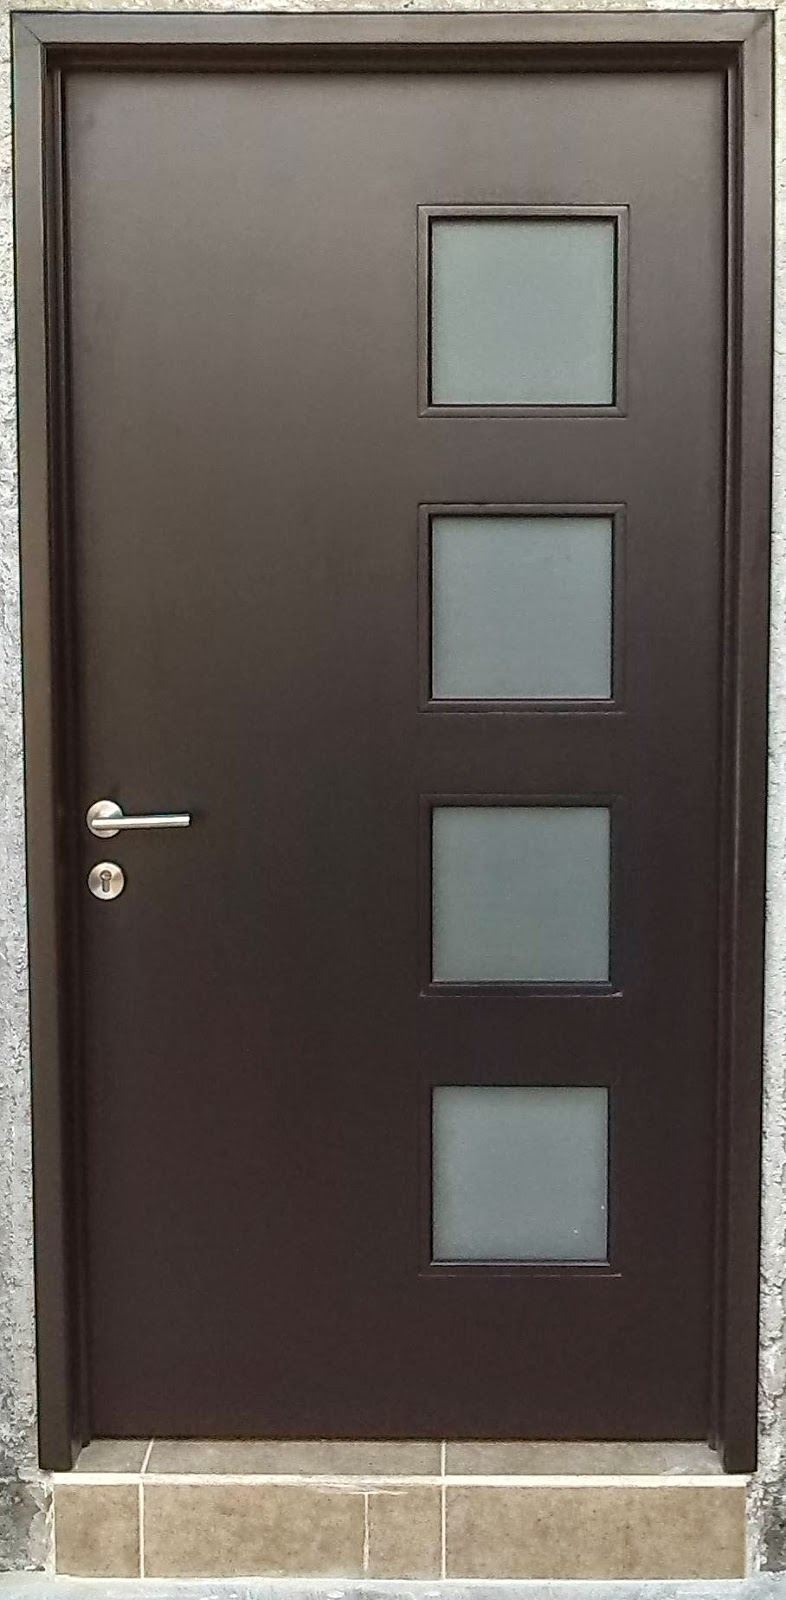 Carpinter as en ecatepec m xico puertas de madera for Puertas de madera interiores minimalistas